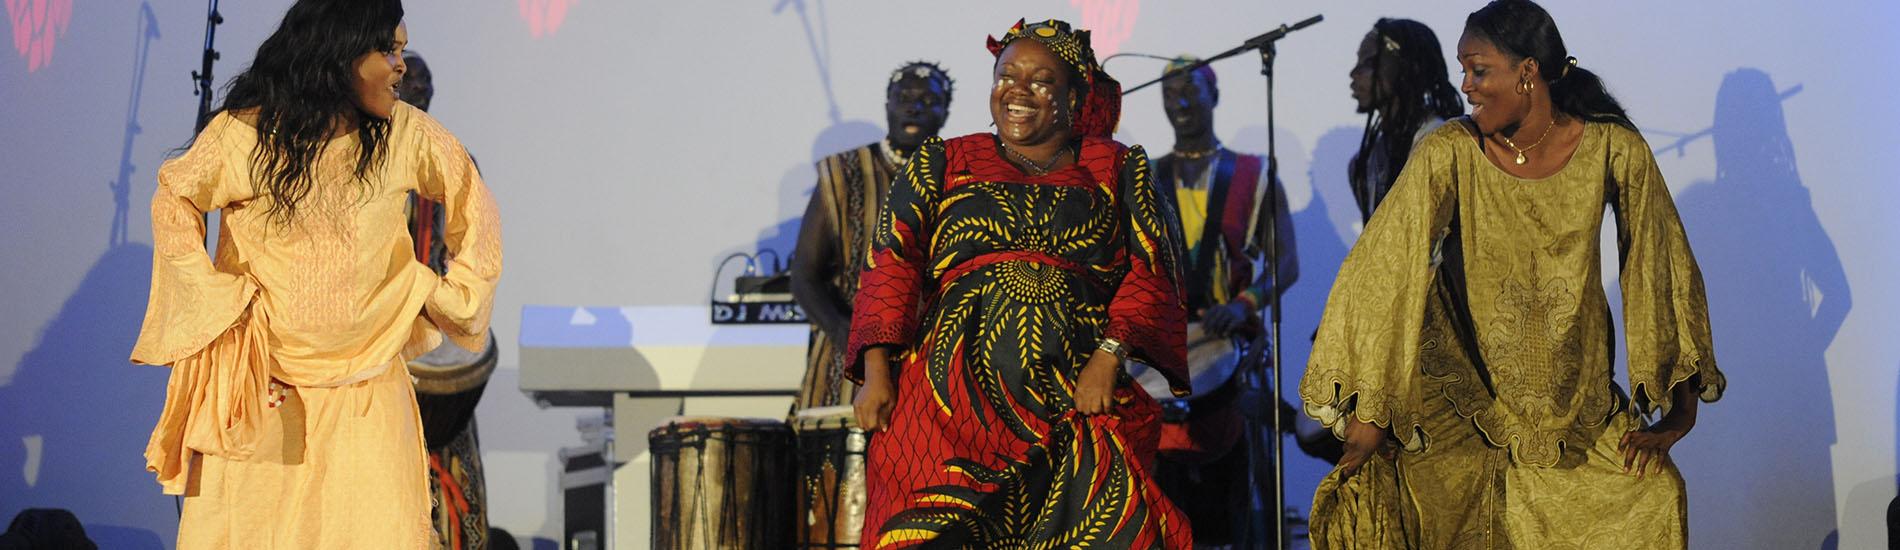 Afrikaanse percussiegroep Sene Percu HEADER 1